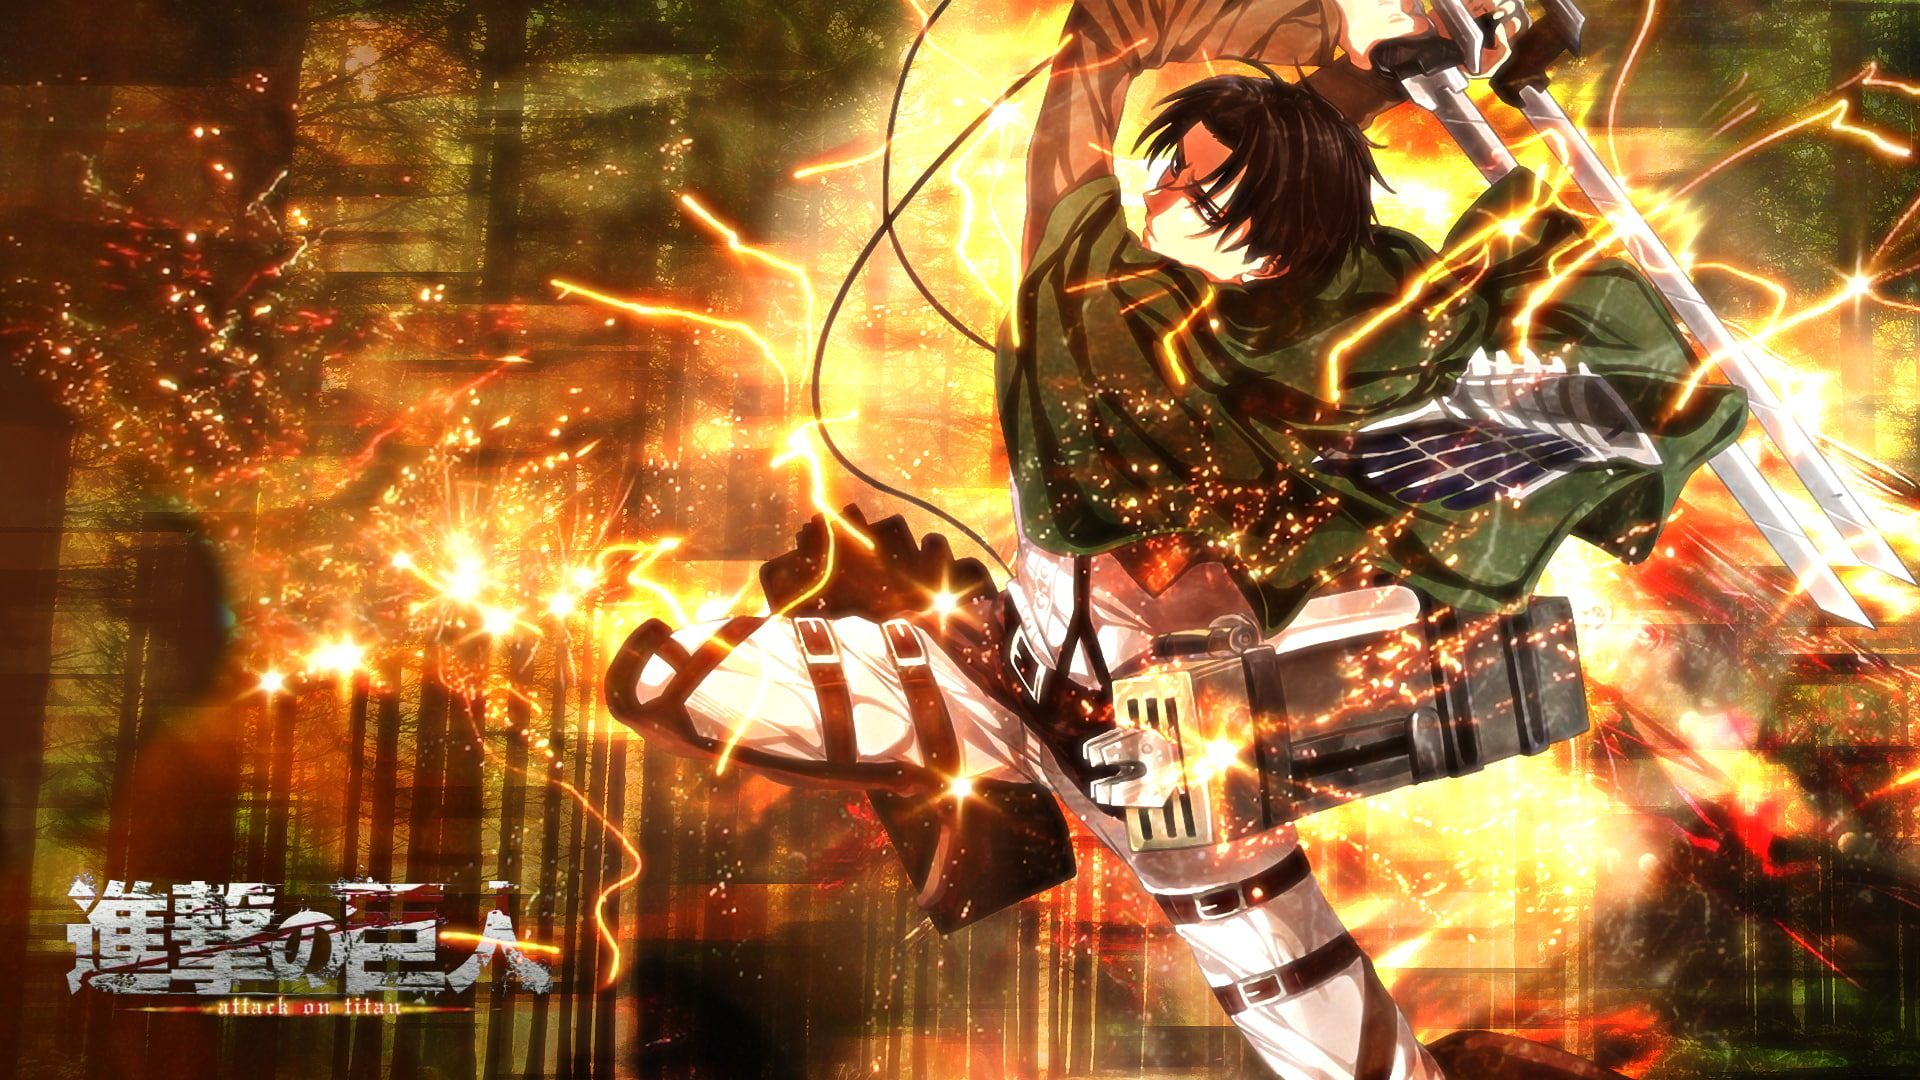 Fantastic 1920x1080 Titan Attack 1080p Wallpaper Hdwallpaper Desktop In 2020 Attack On Titan Attack On Titan Levi Anime Wallpaper